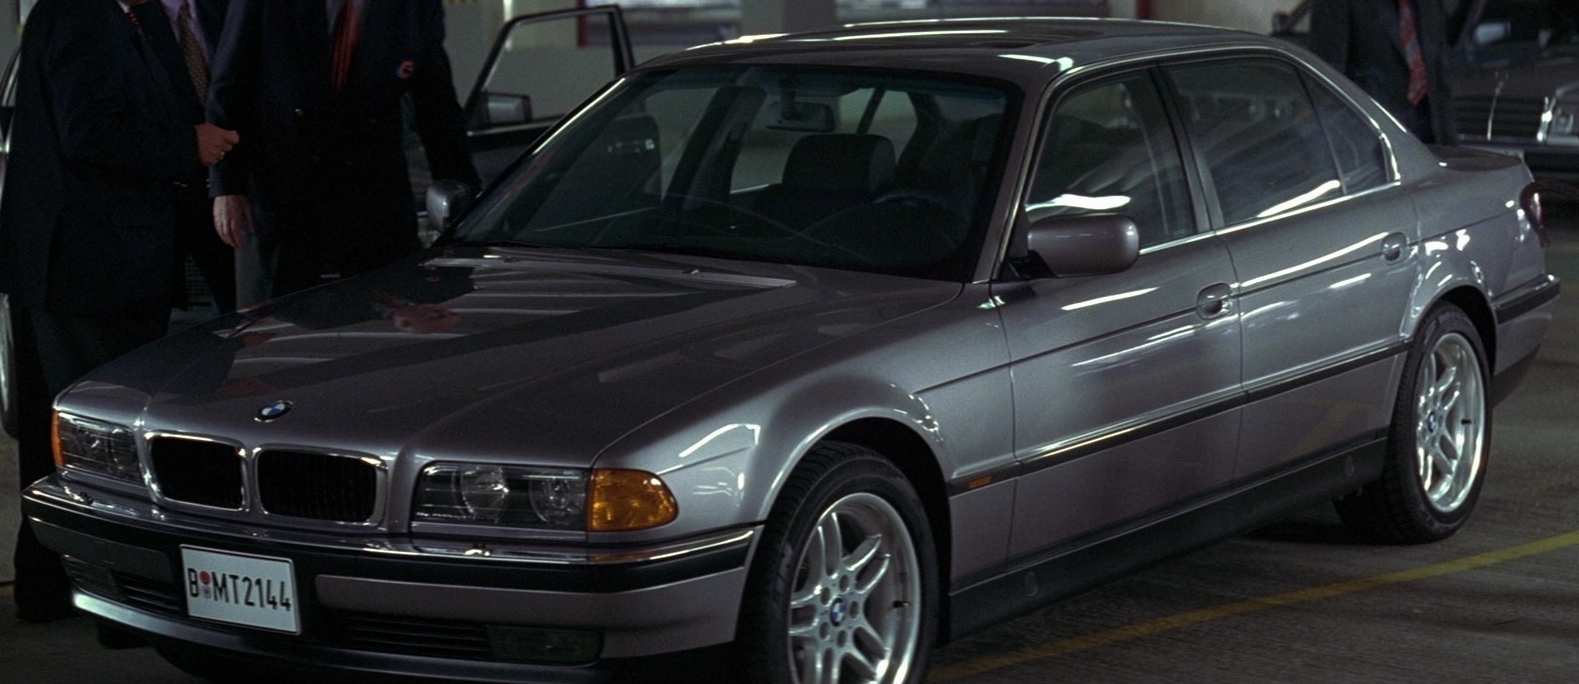 Affordable Bond Cars - bmw_750il